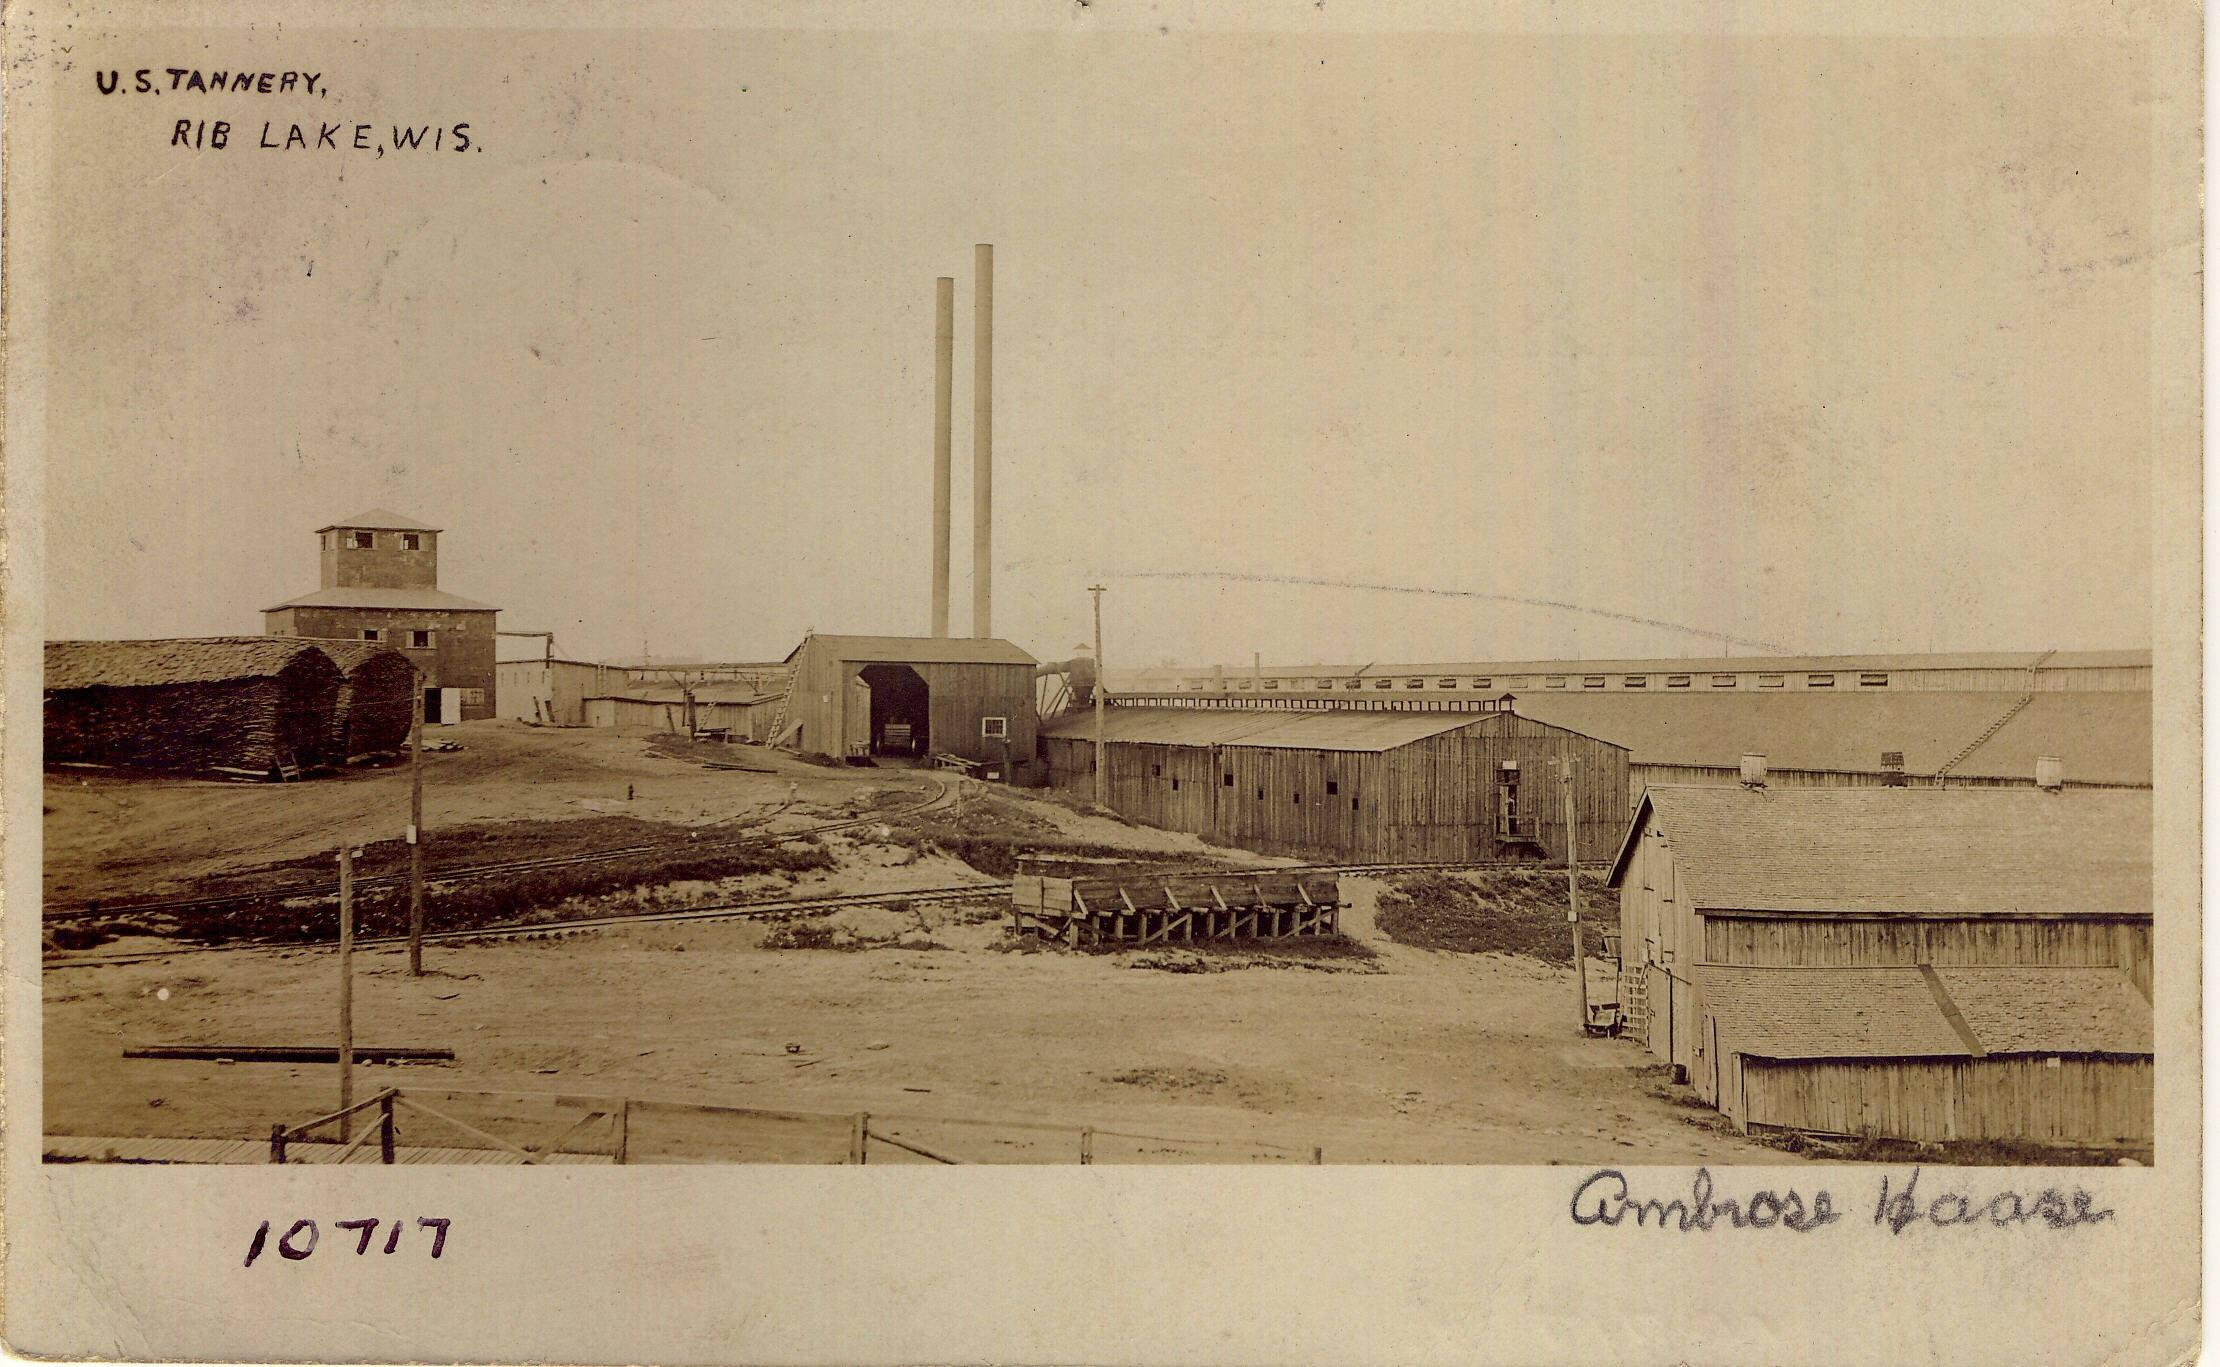 "C:\Users\Robert P. Rusch\Desktop\II. RLHSoc\Documents & Photos-Scanned\Rib Lake History 10700-10799\10717-P. ""U.S. Tannery, Rib Lake, Wis"" View from south c. 19.jpg"